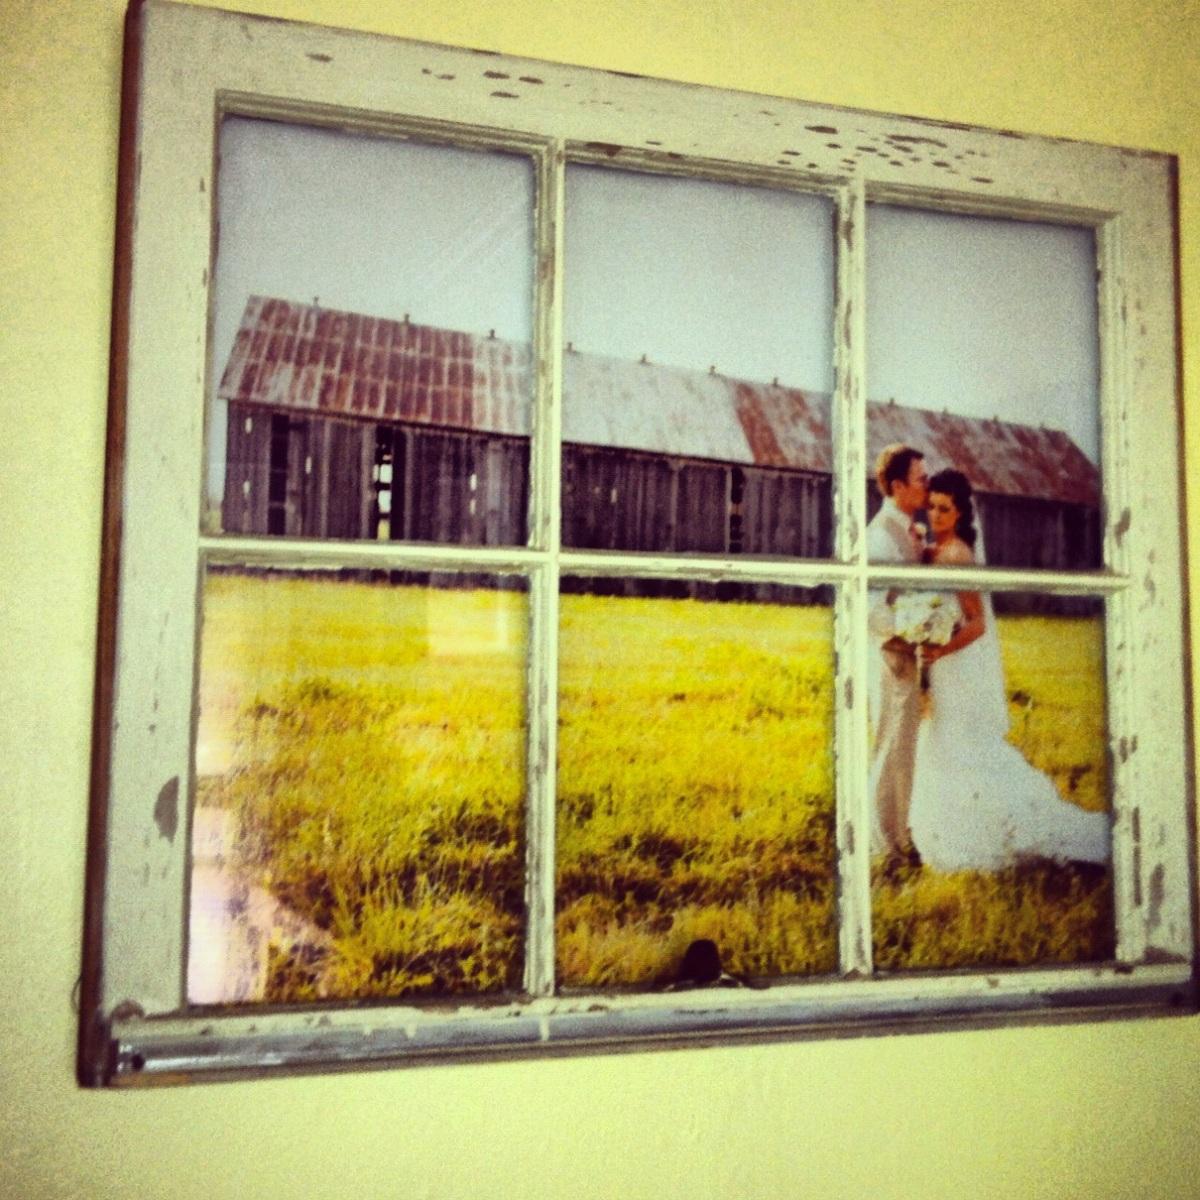 diy vintage window pane picture frame the hilliard home. Black Bedroom Furniture Sets. Home Design Ideas